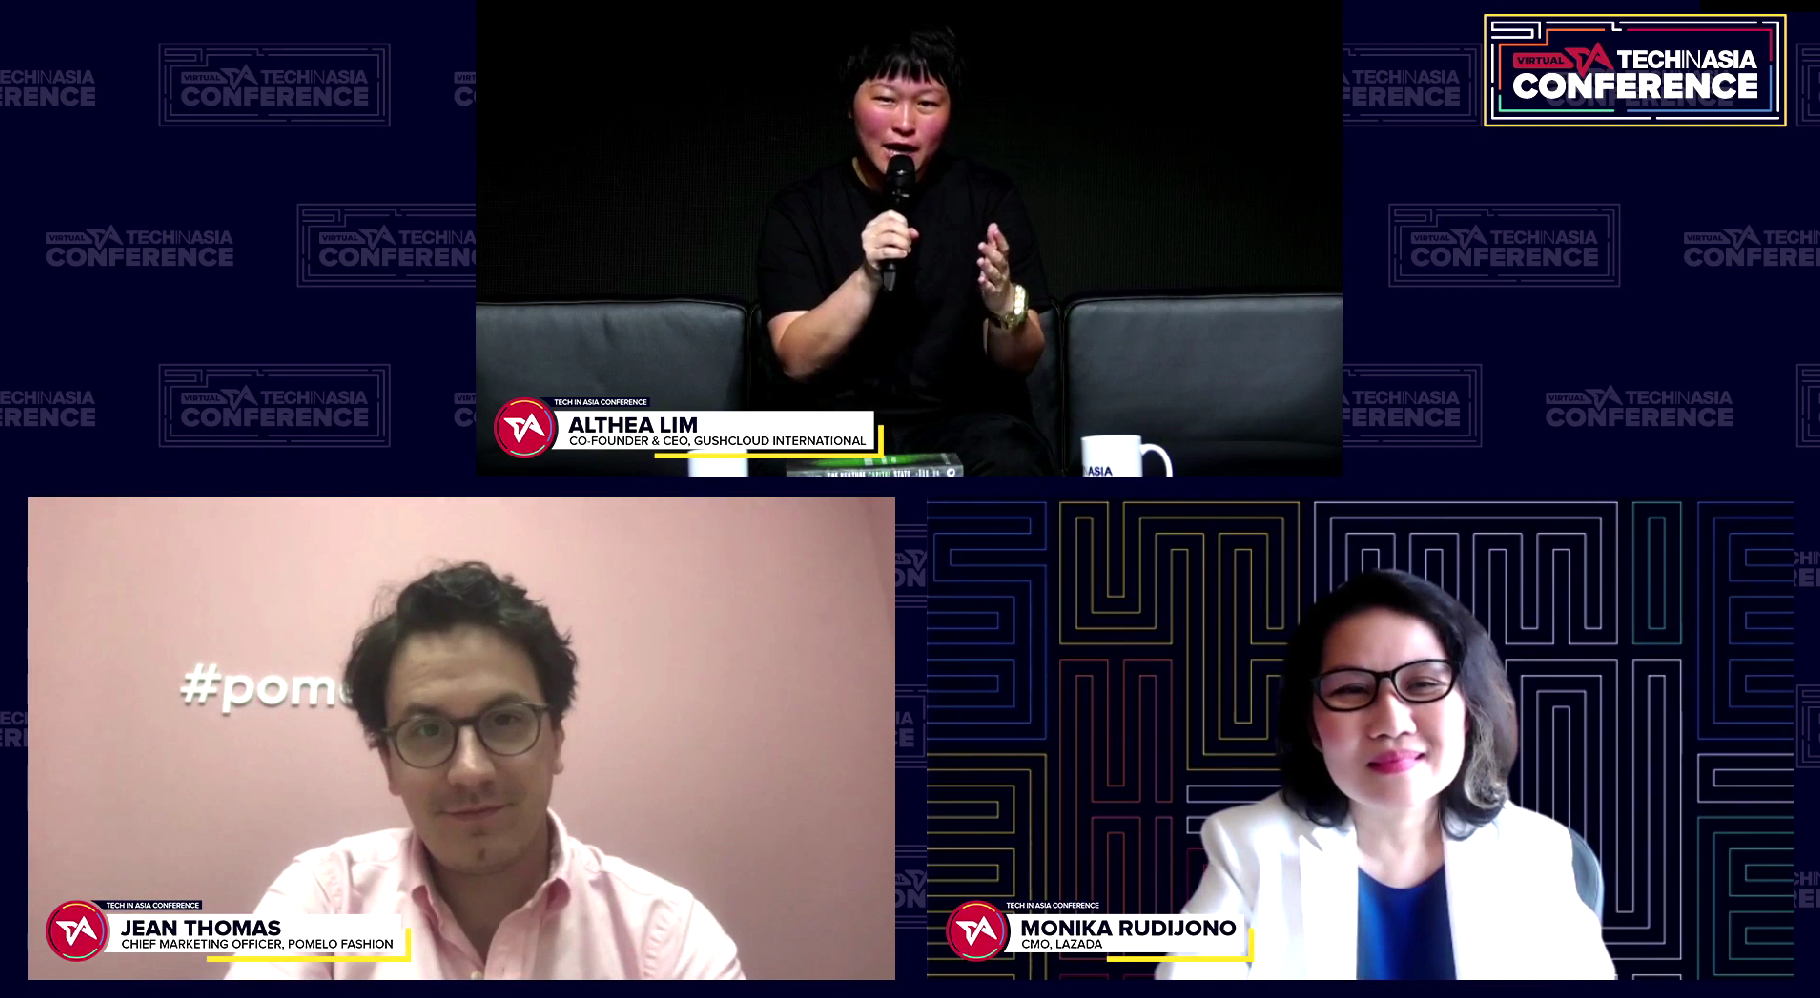 monika-rudijono_jean-thomas-tehinasia-conference-2020-virtual-edition